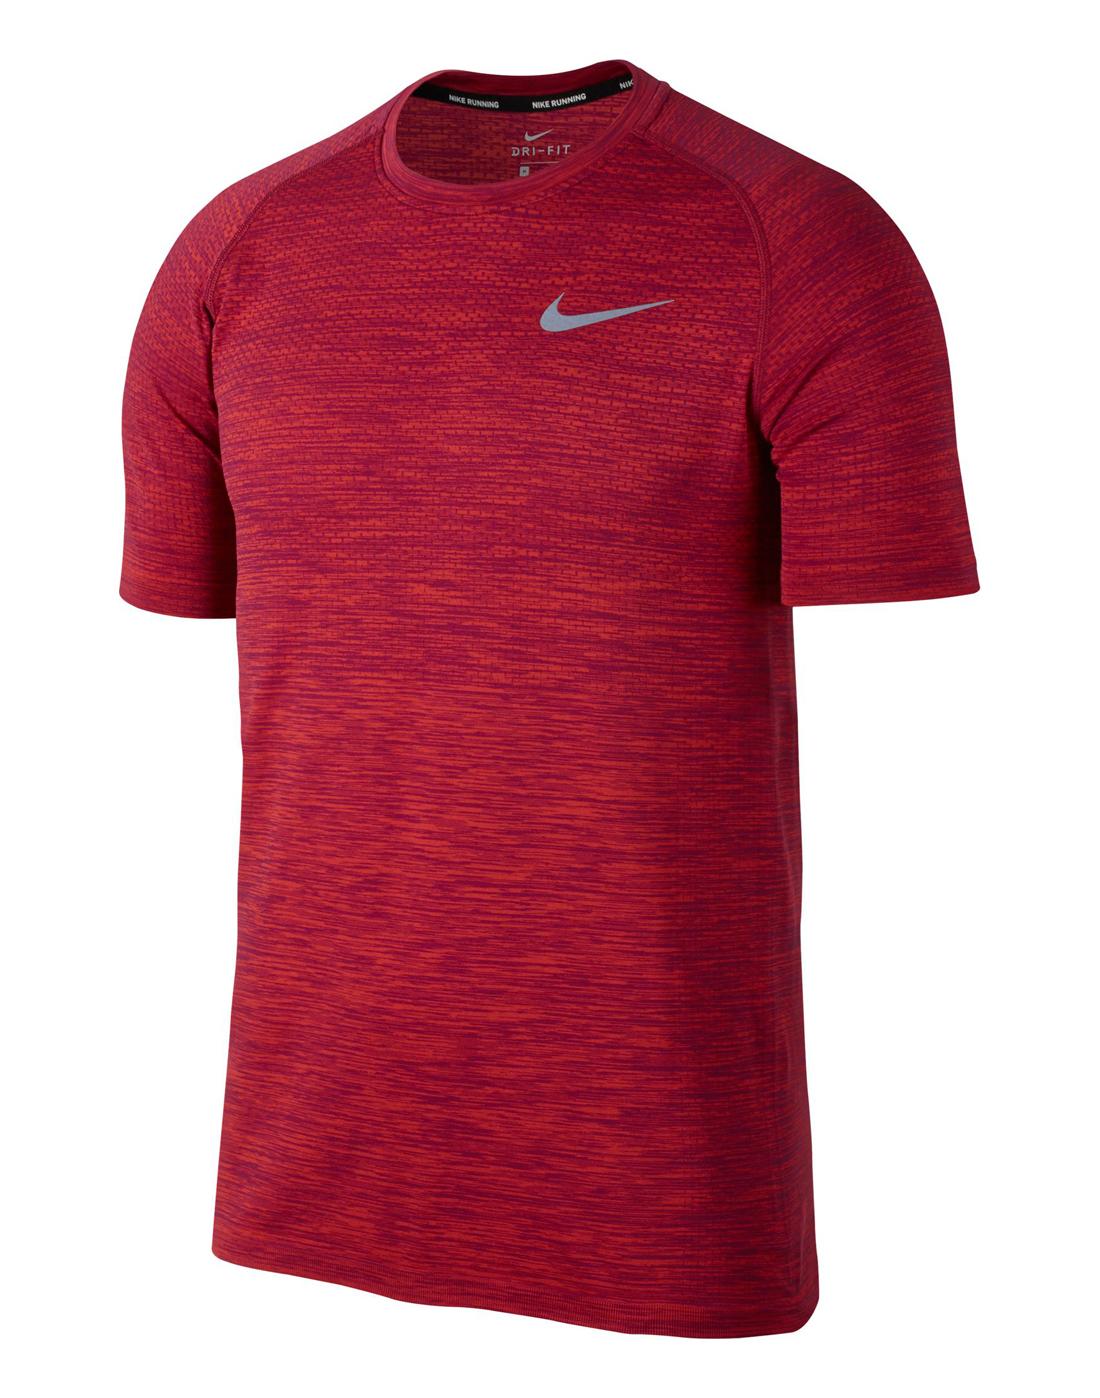 Nike Performance Shield Training Jacket Black//White DRI-FIT Size XL Youth